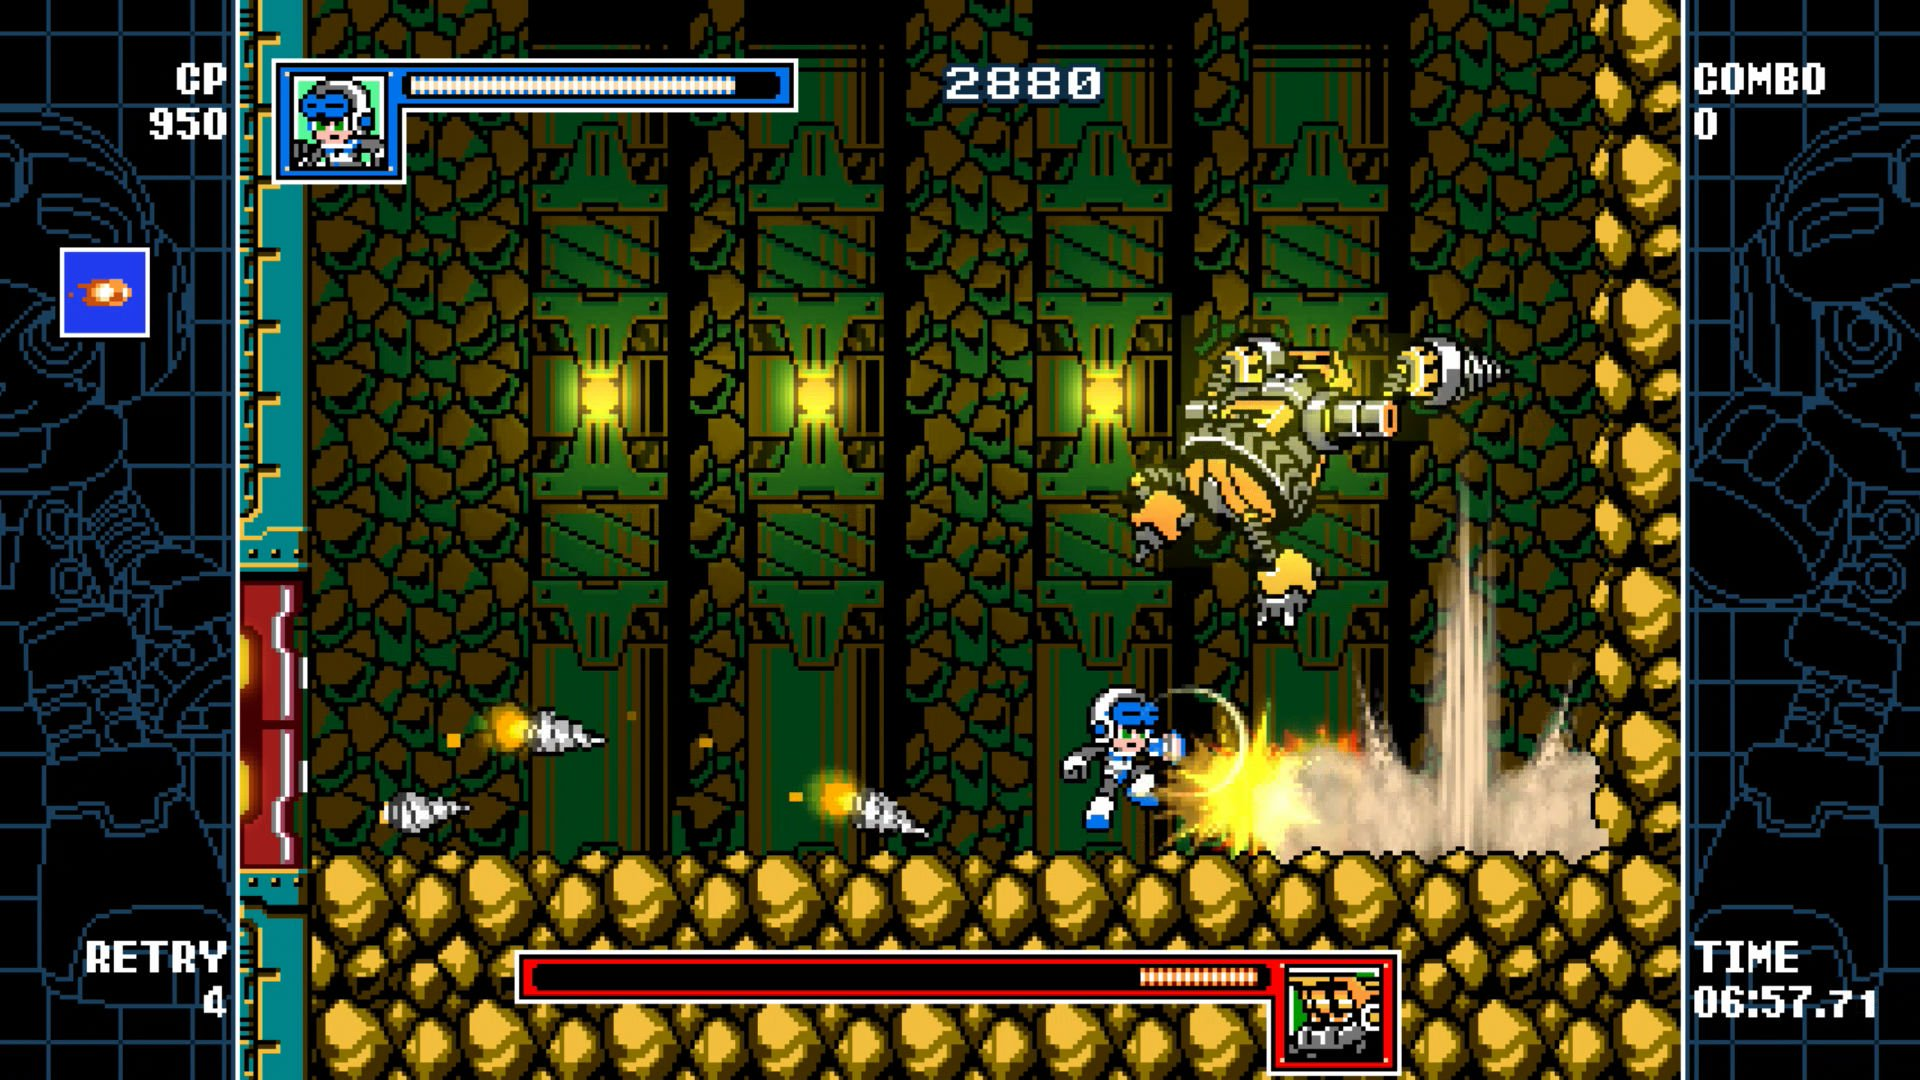 Mighty Gunvolt Burst deserves a little more credit for preserving the spirit of Mega Man screenshot